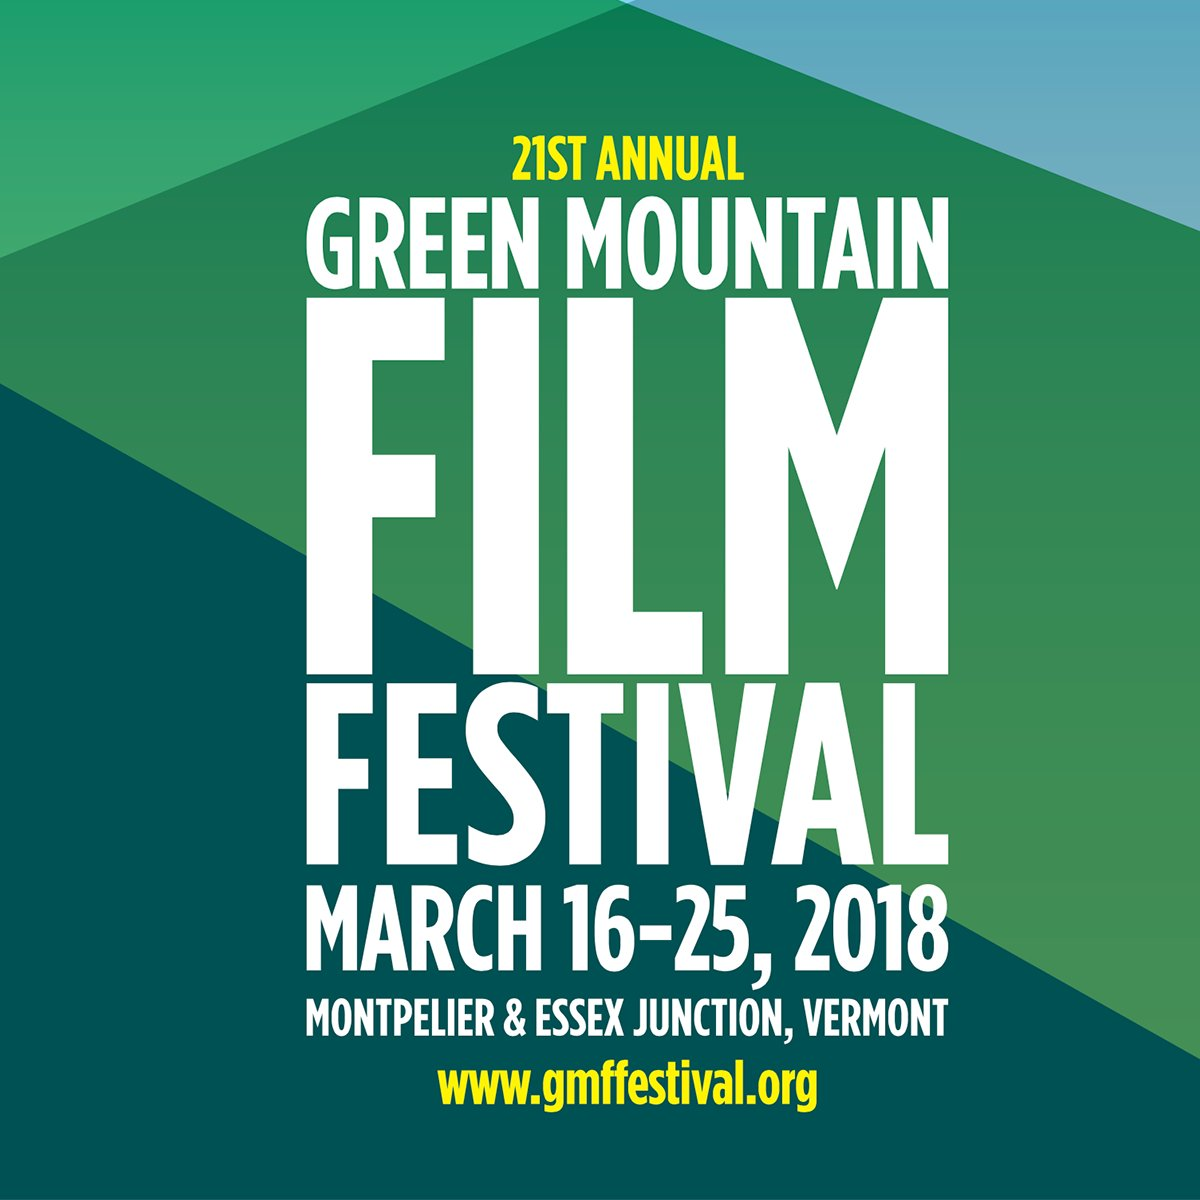 GreenMountain.jpg